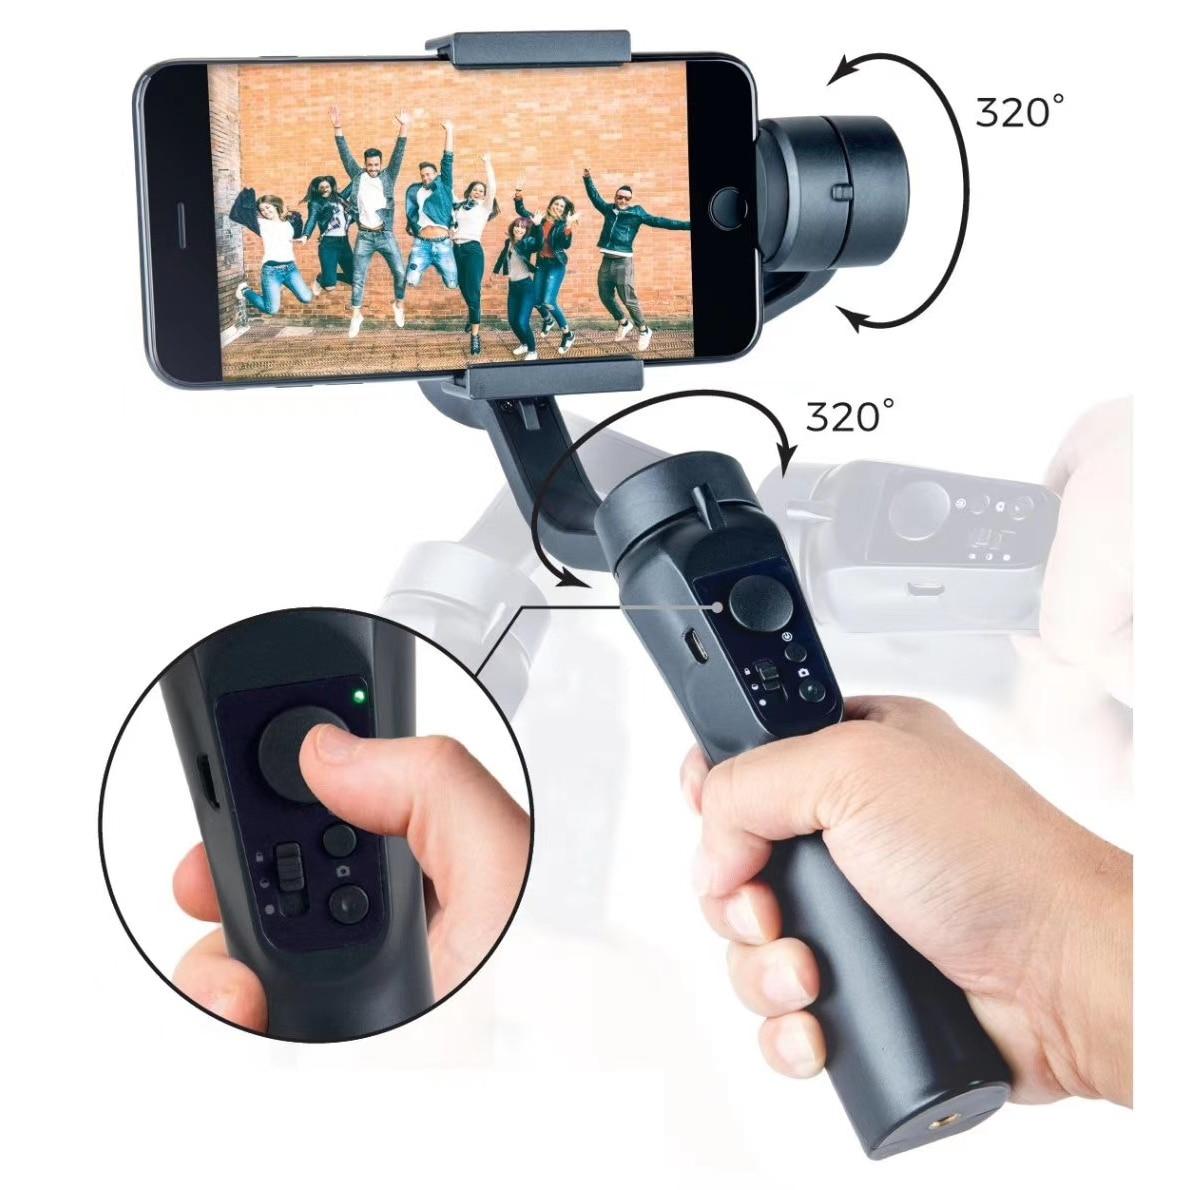 Handheld Phone Gimbal Stabilizer 3-Axis  PTZ Tripod  Anti-Shake For Smartphone Vlog iPhone/Samsung/Huawei/Xiaomi/Universal